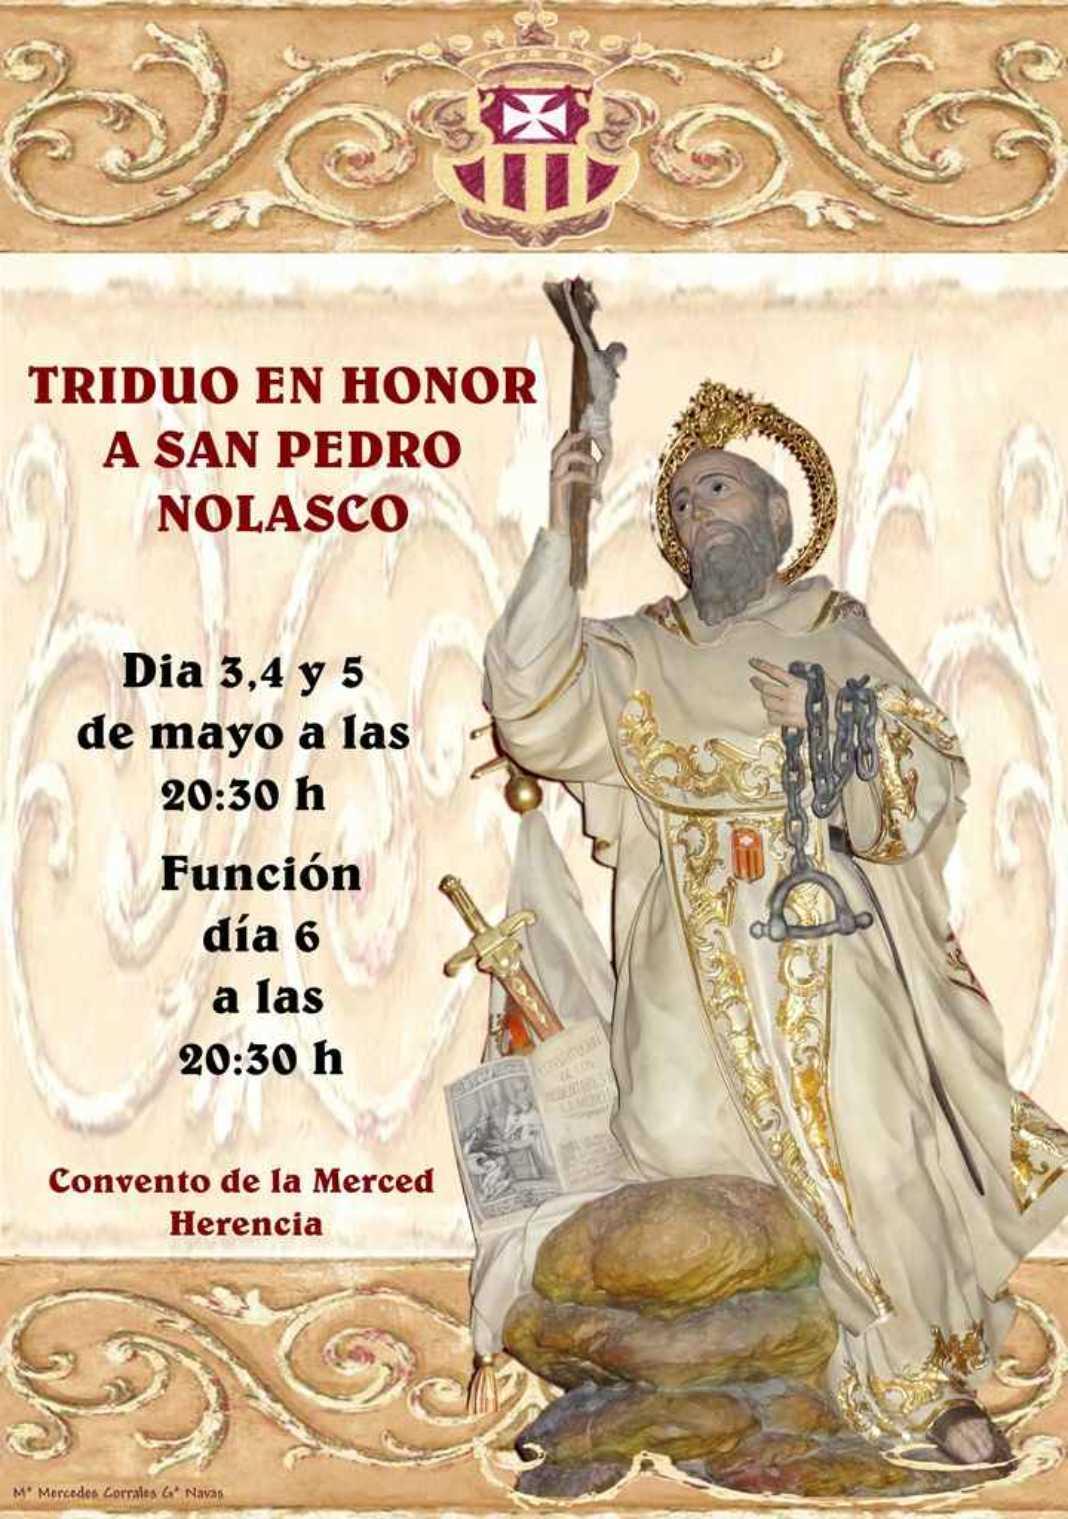 Triduo en honor a San Pedro Nolasco 2